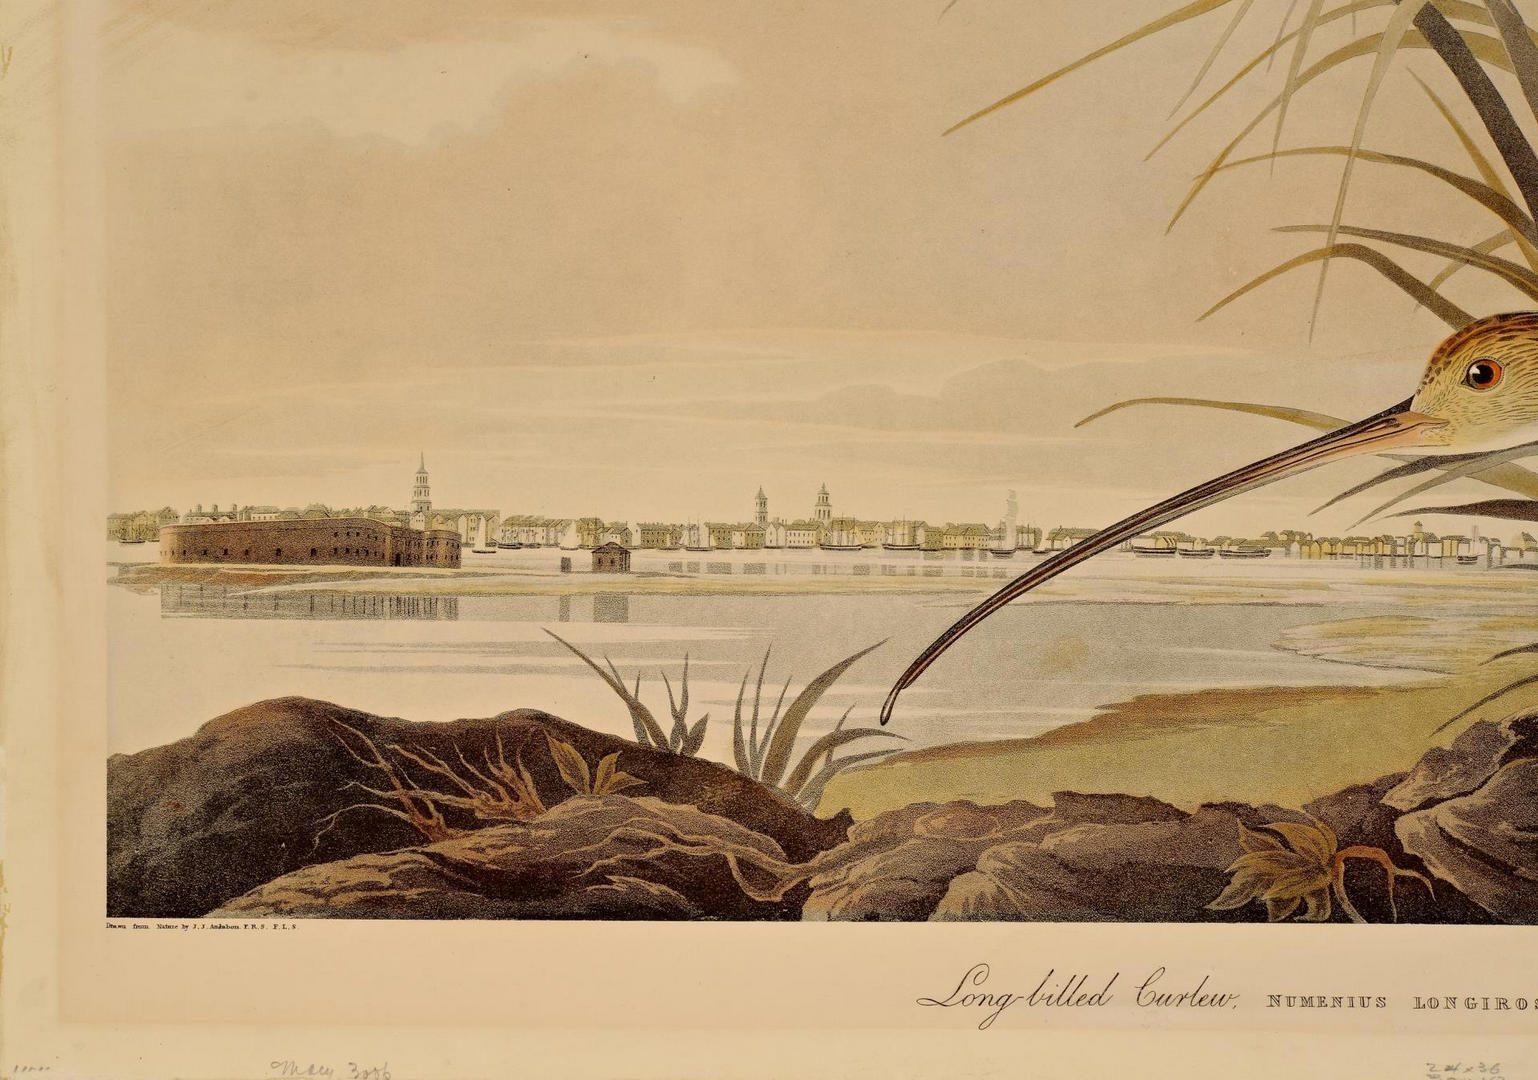 Lot 101: After Audubon, Long Billed Curlew